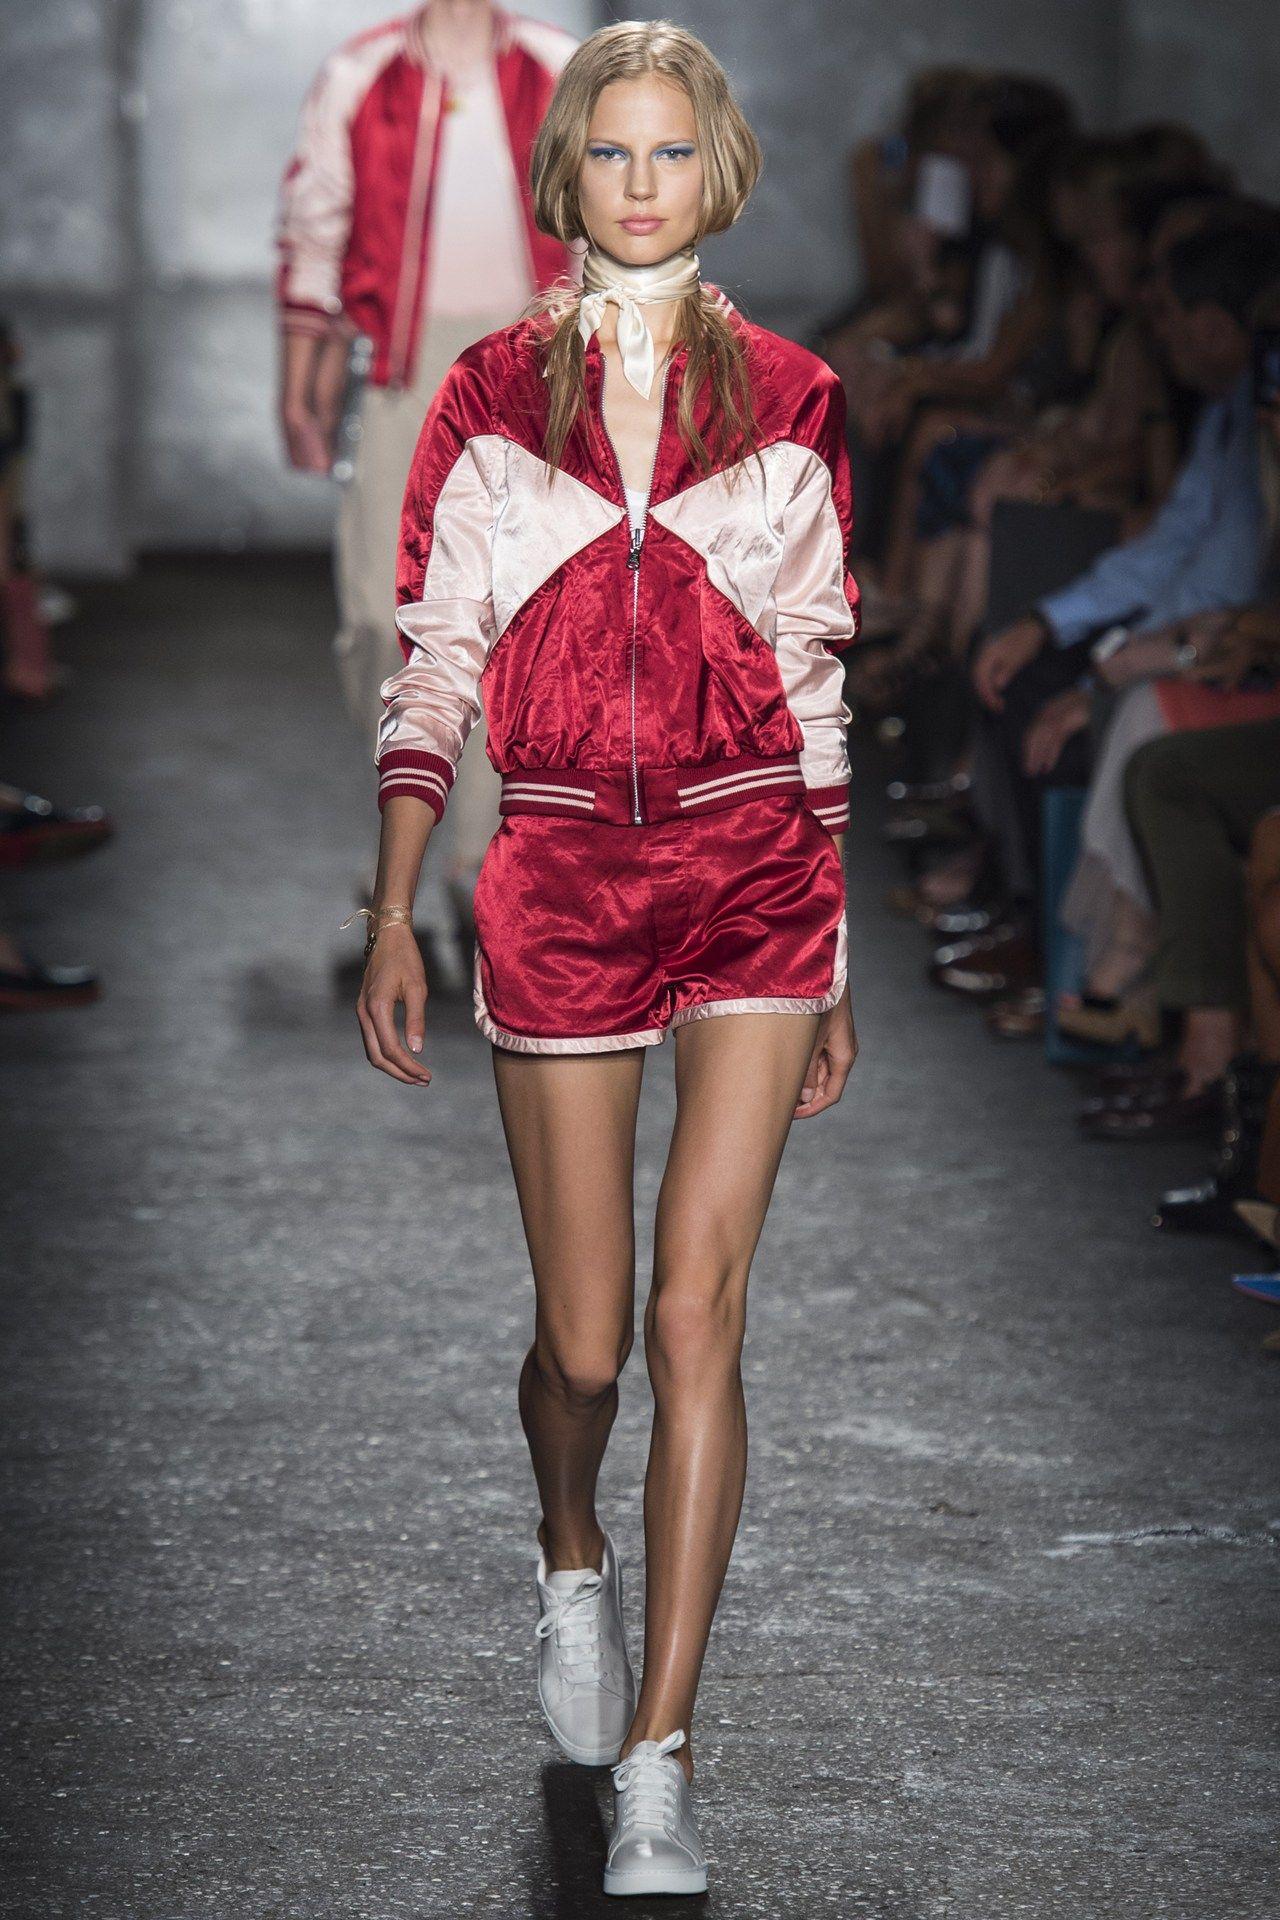 Fashion style Fashion Spring trend: chic sportswear for lady